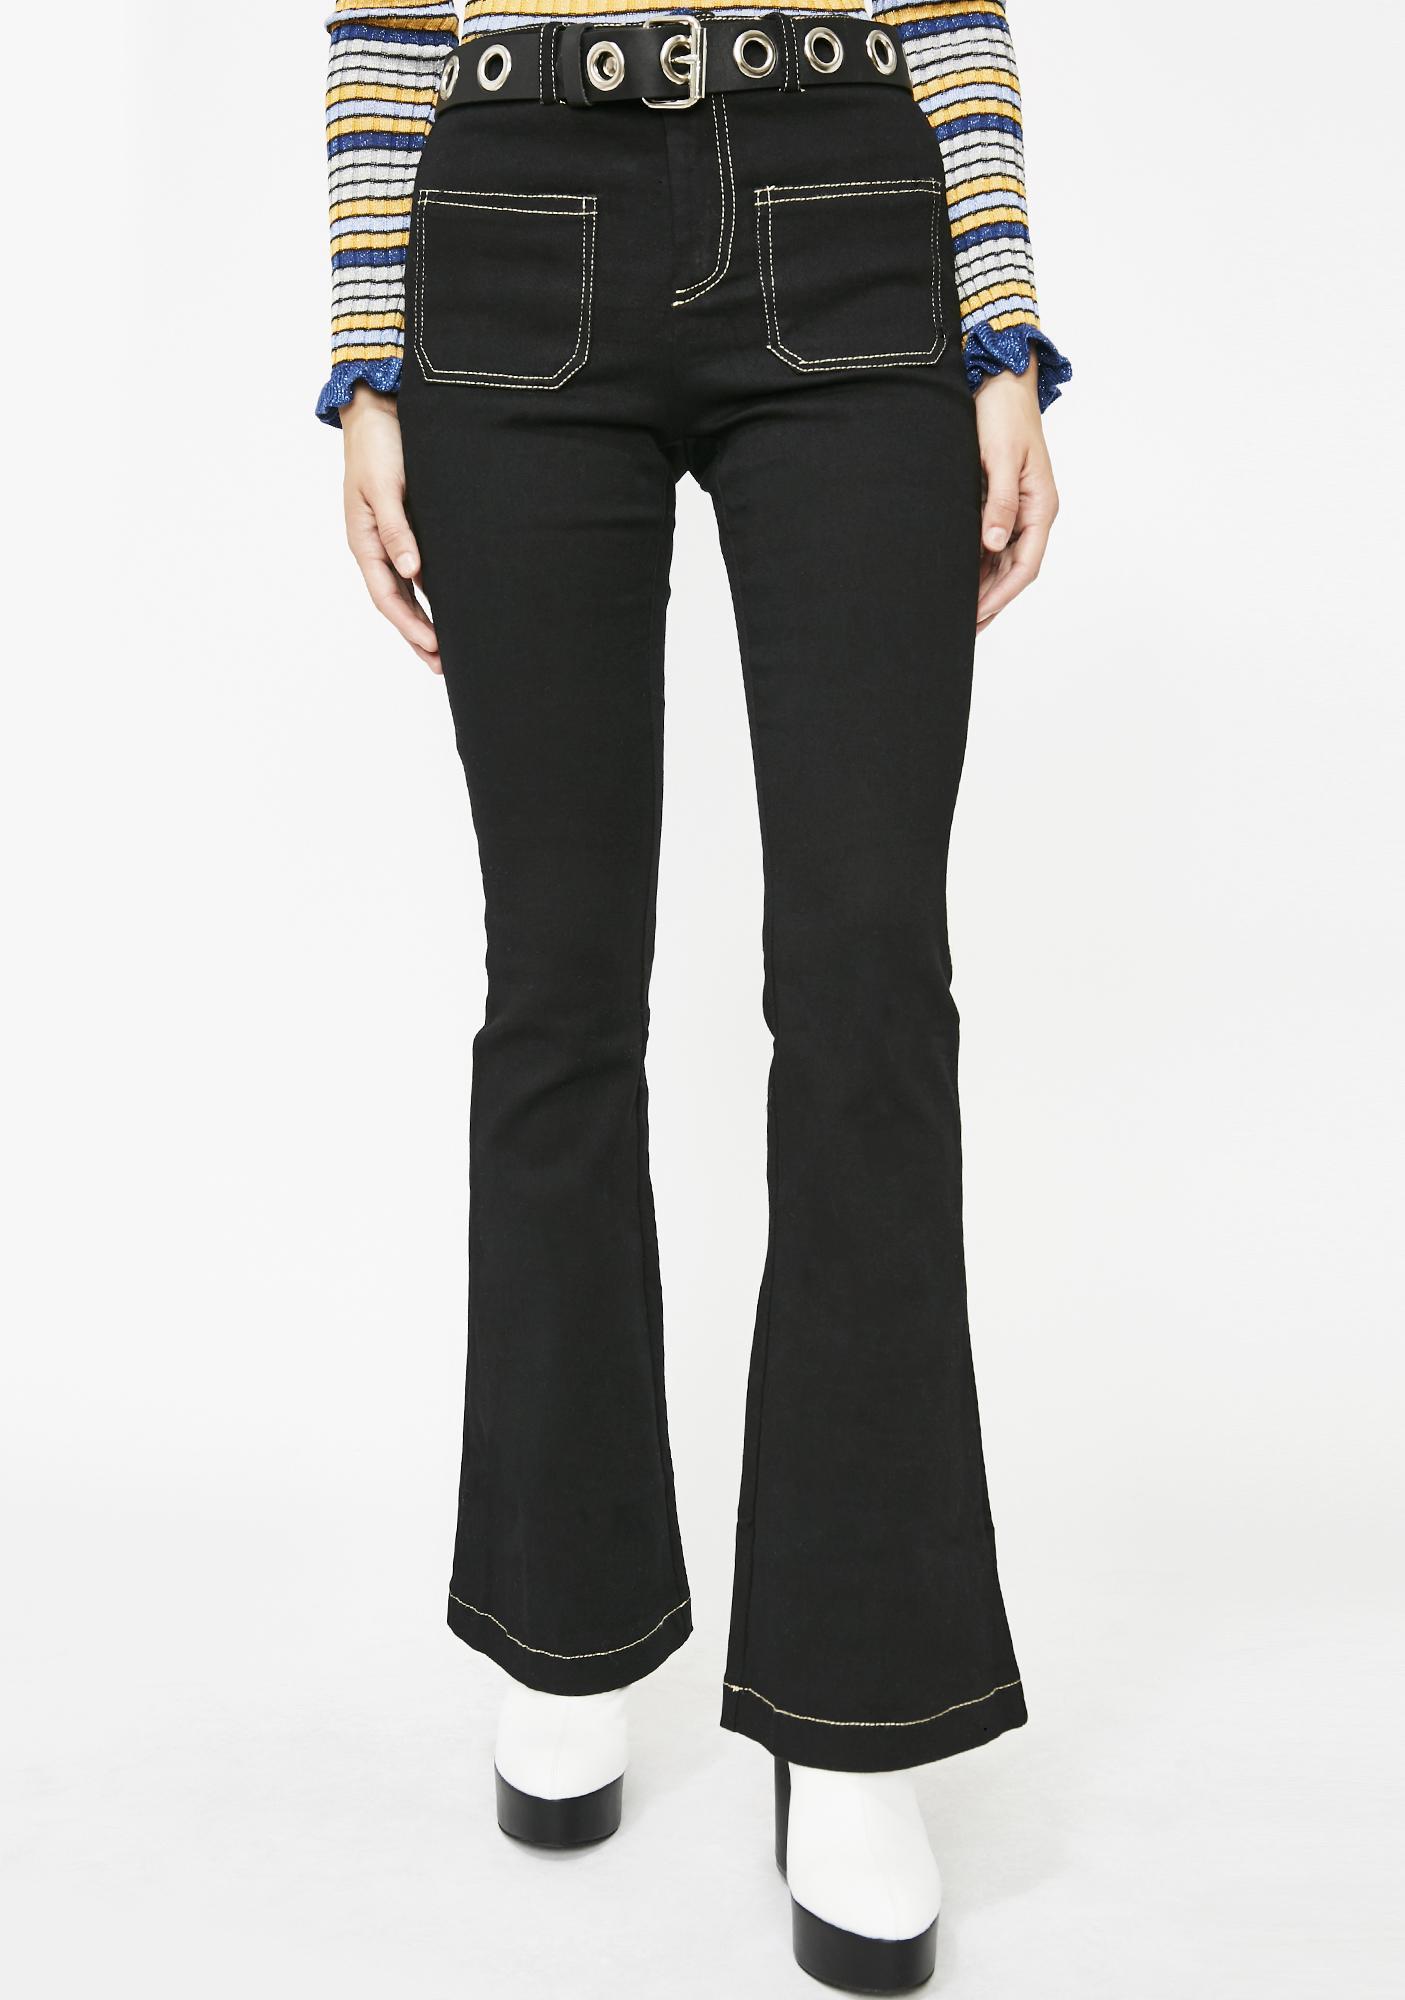 Lady Leisure Flare Pants